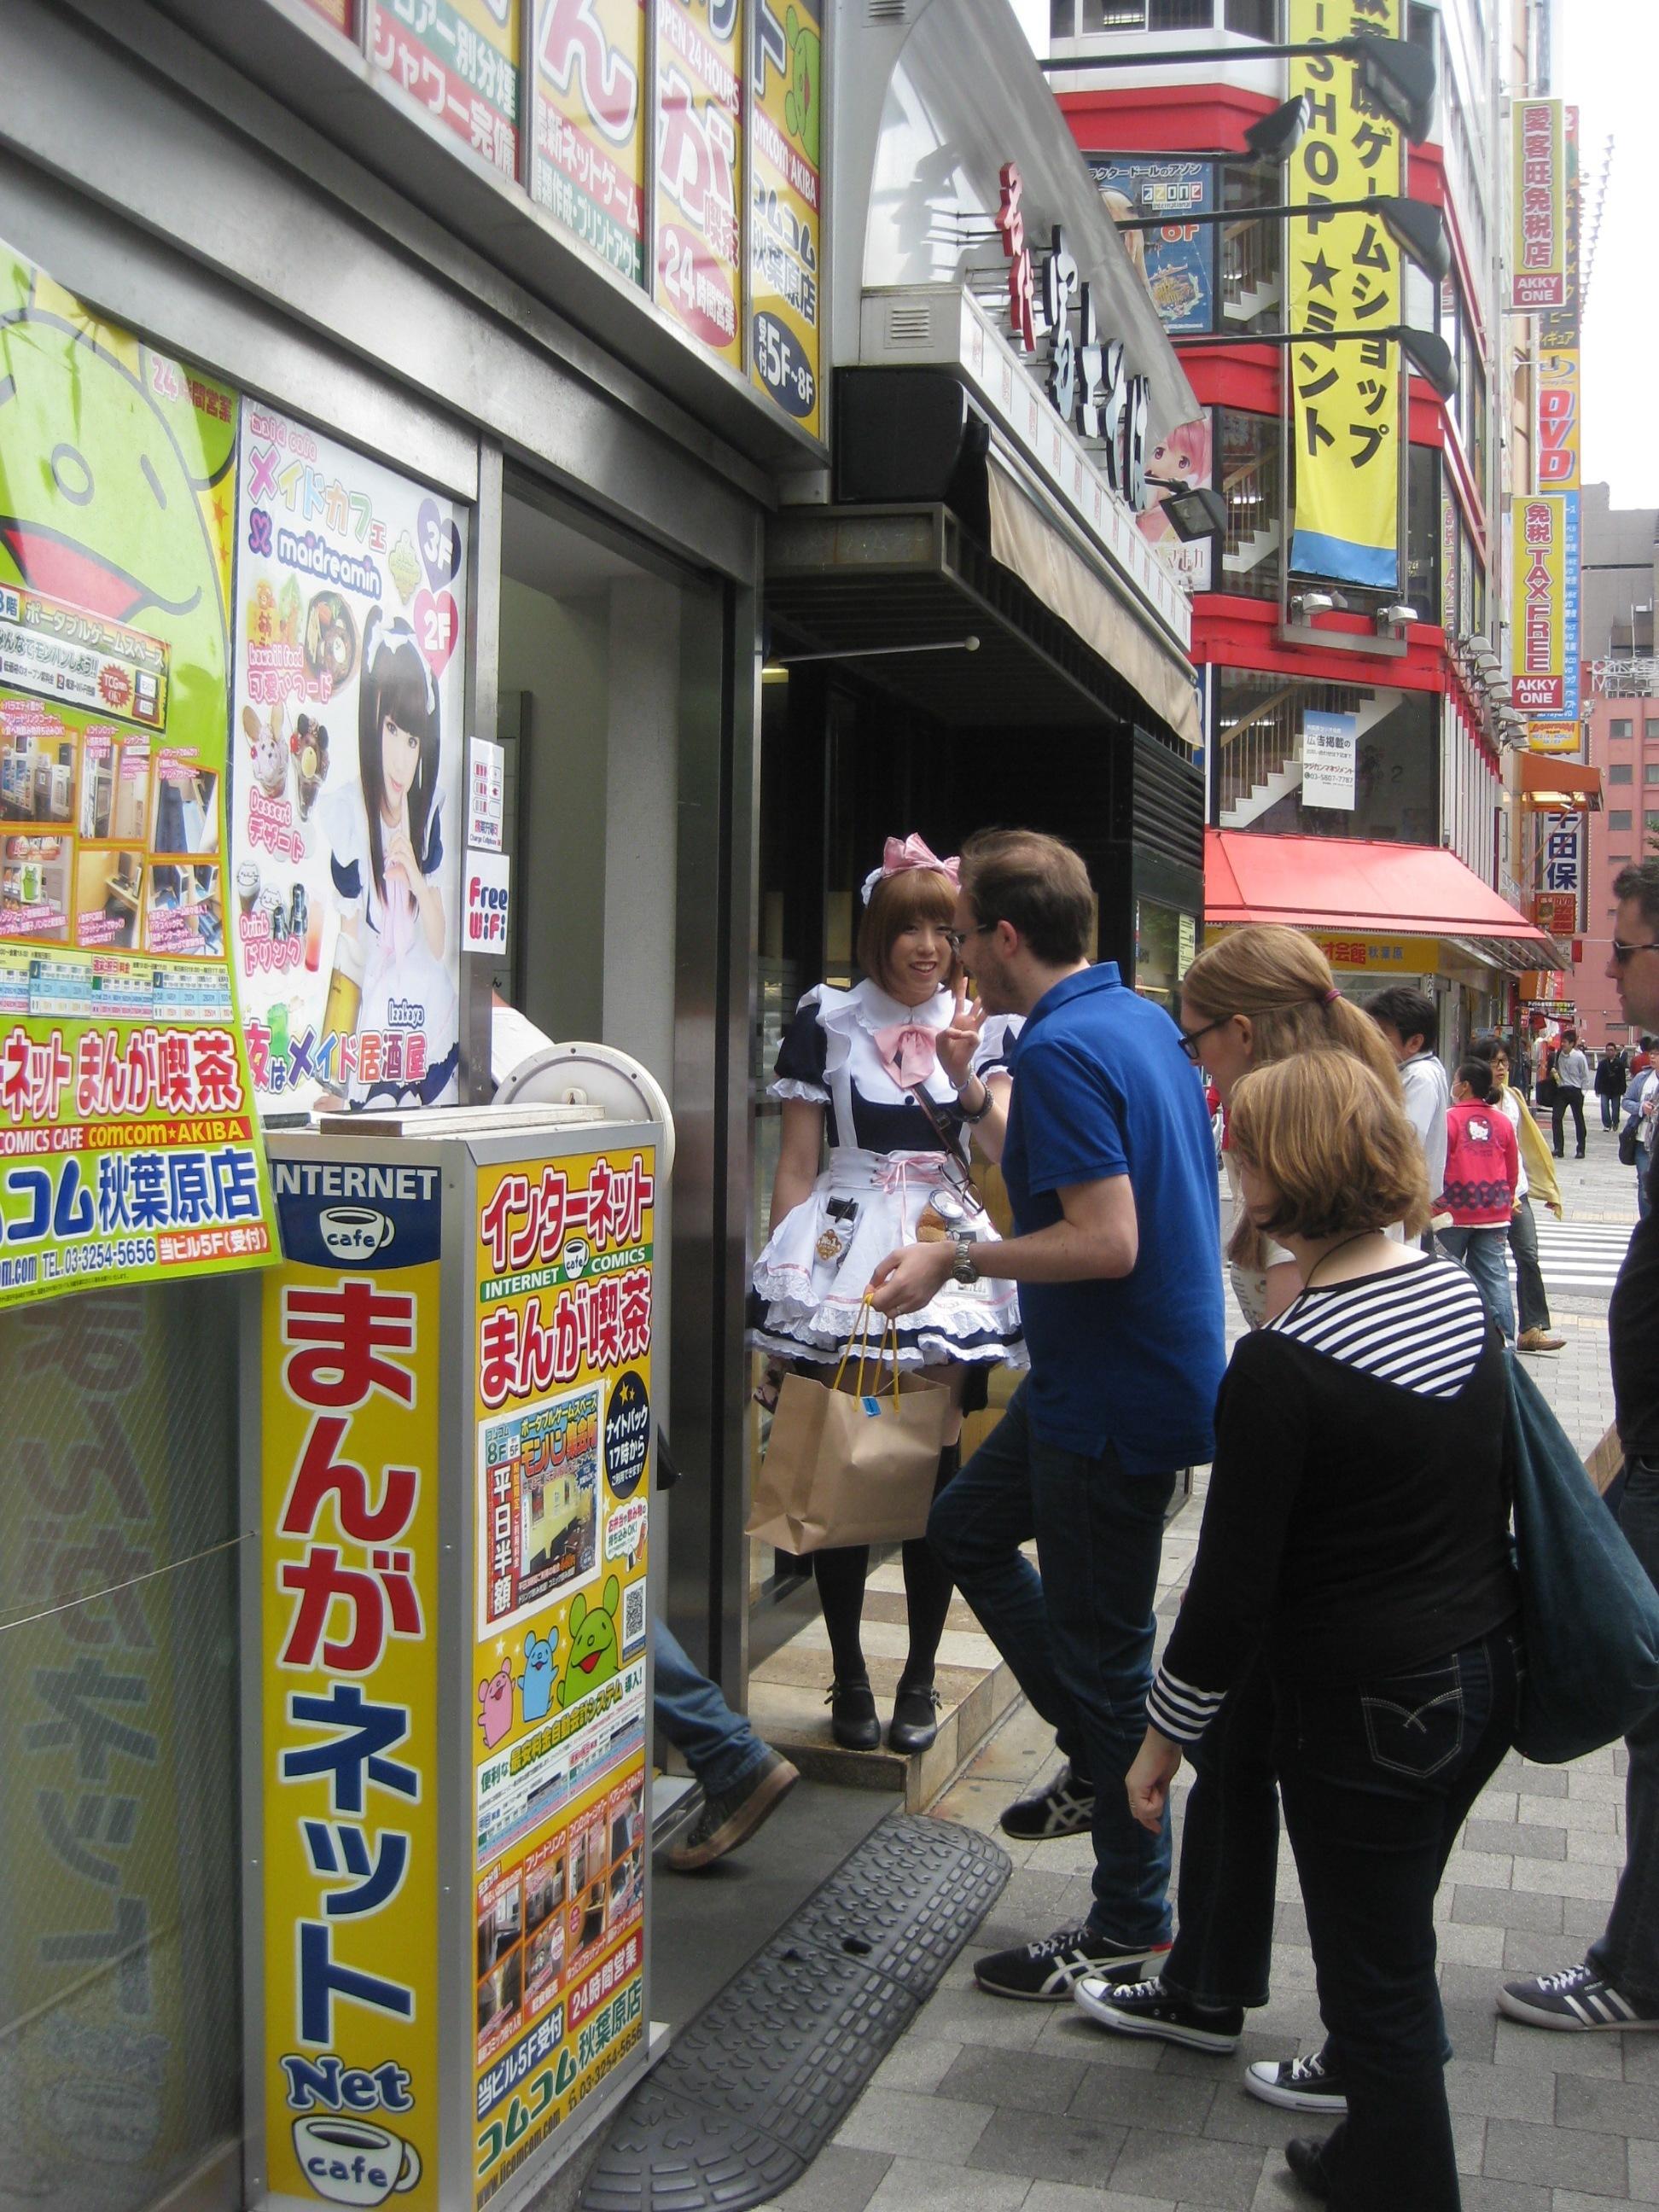 Manga and Maids